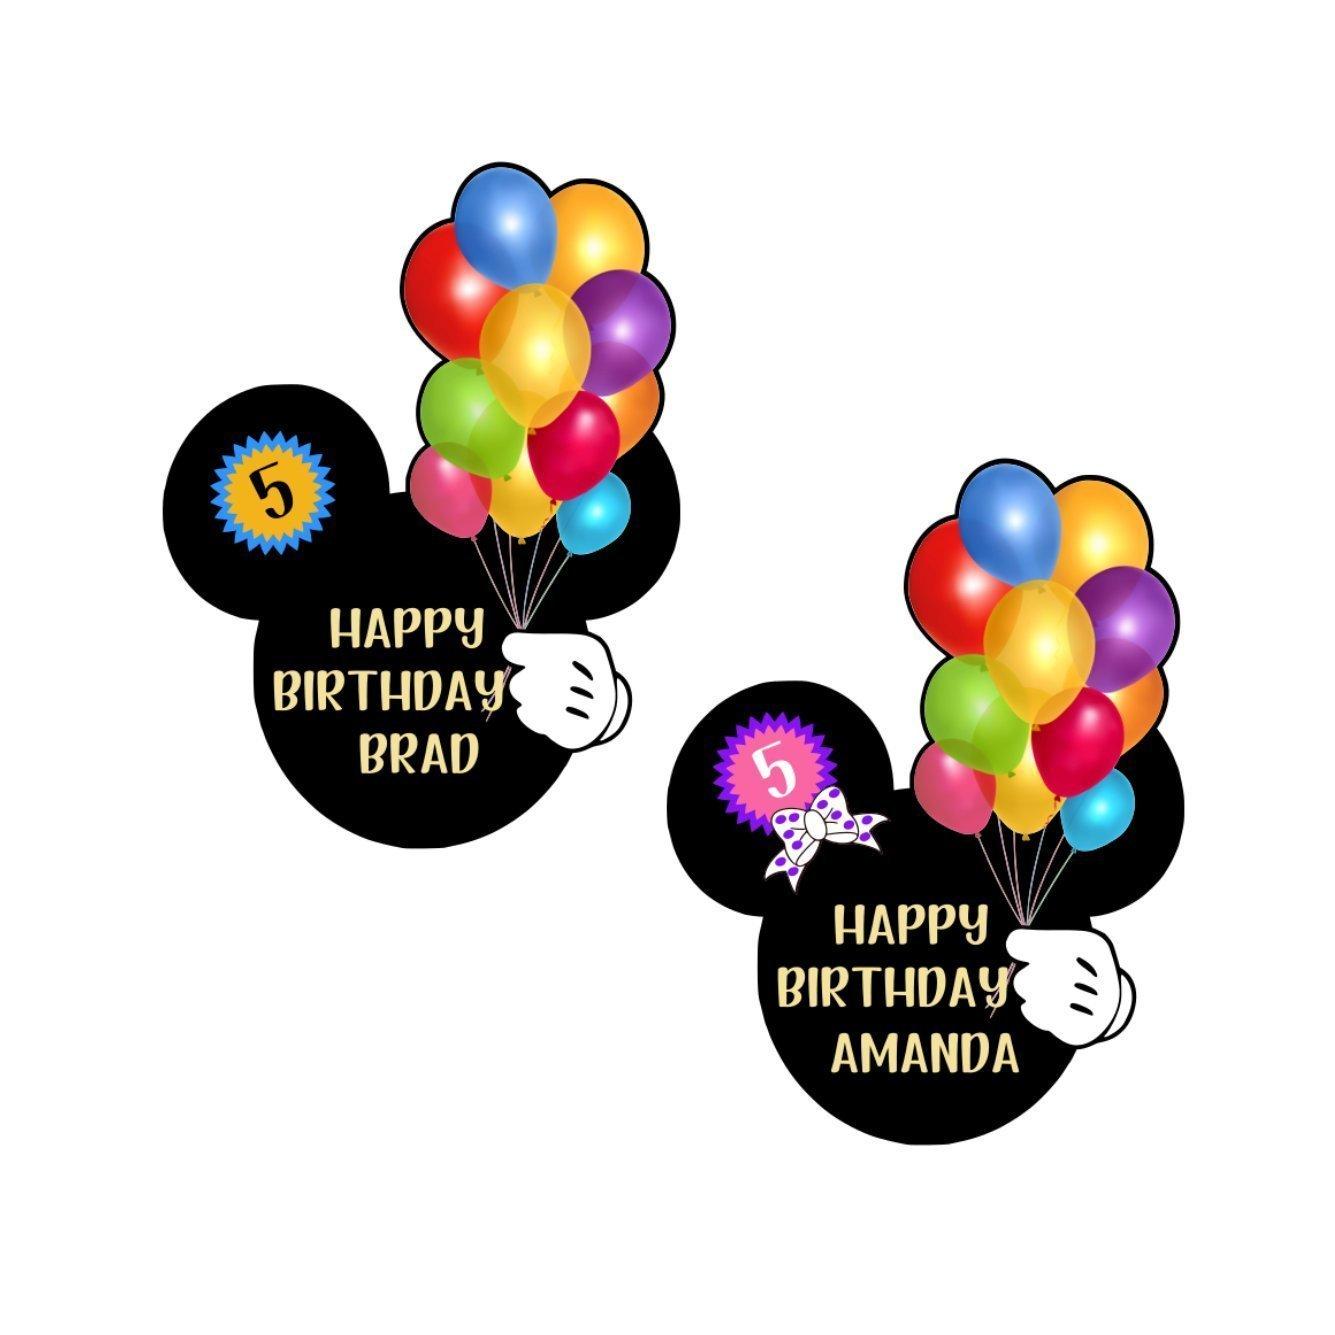 Happy Birthday Mickey Head || Disney Cruise Birthday Magnet For Stateroom Door || Disney Balloons Door Magnet || Disney Cruise Magnets